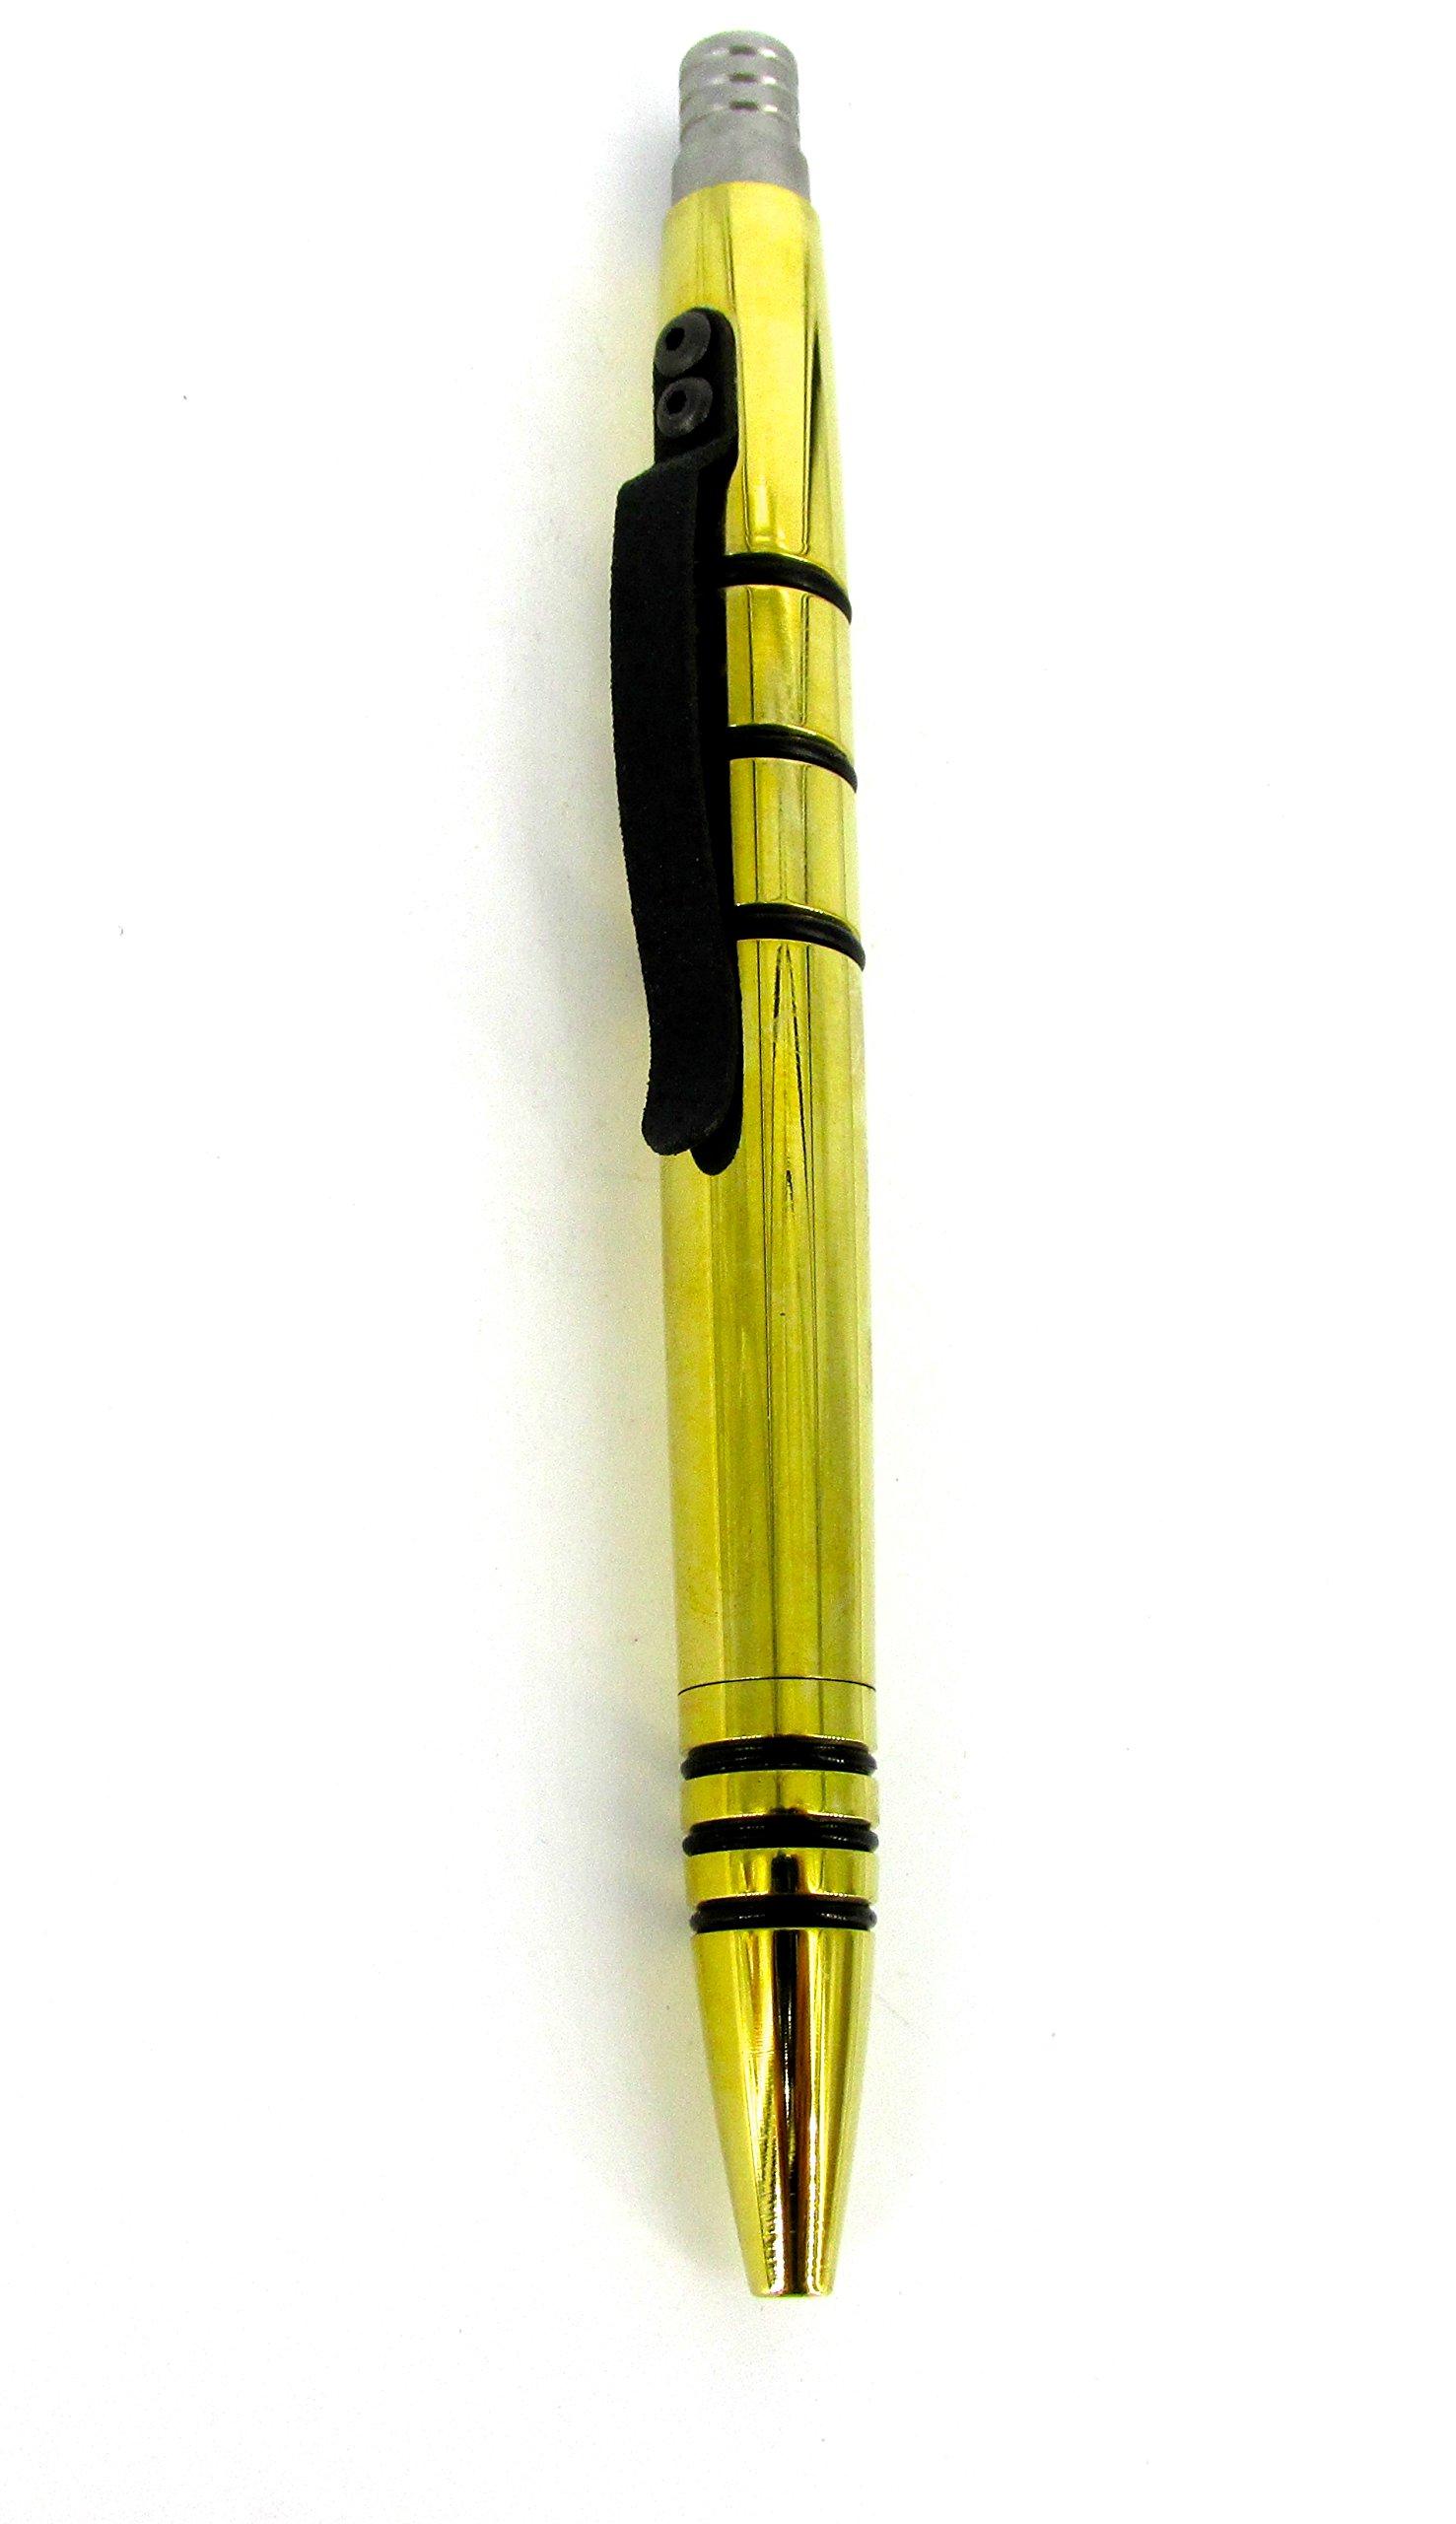 Tuff-Writer Mini Click Series Tactical Pen Polished Brass